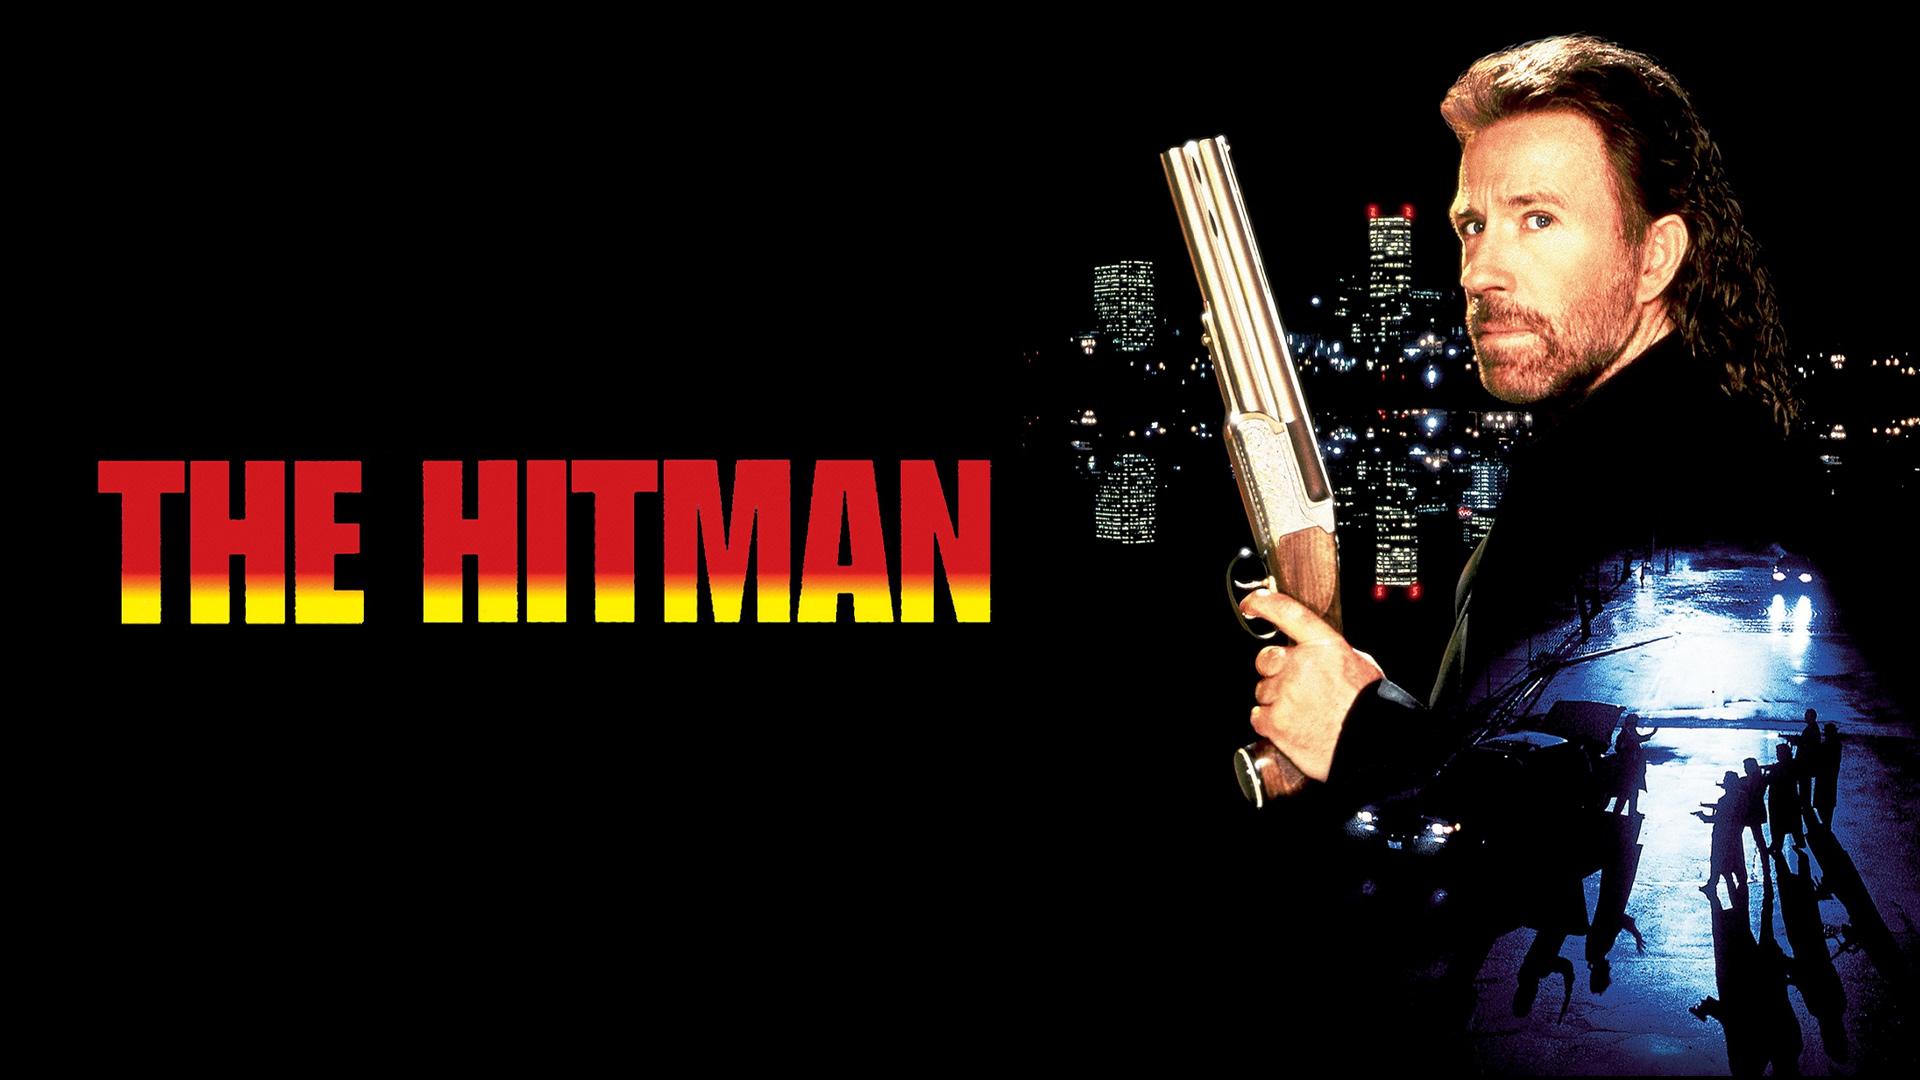 The Hitman (1991)